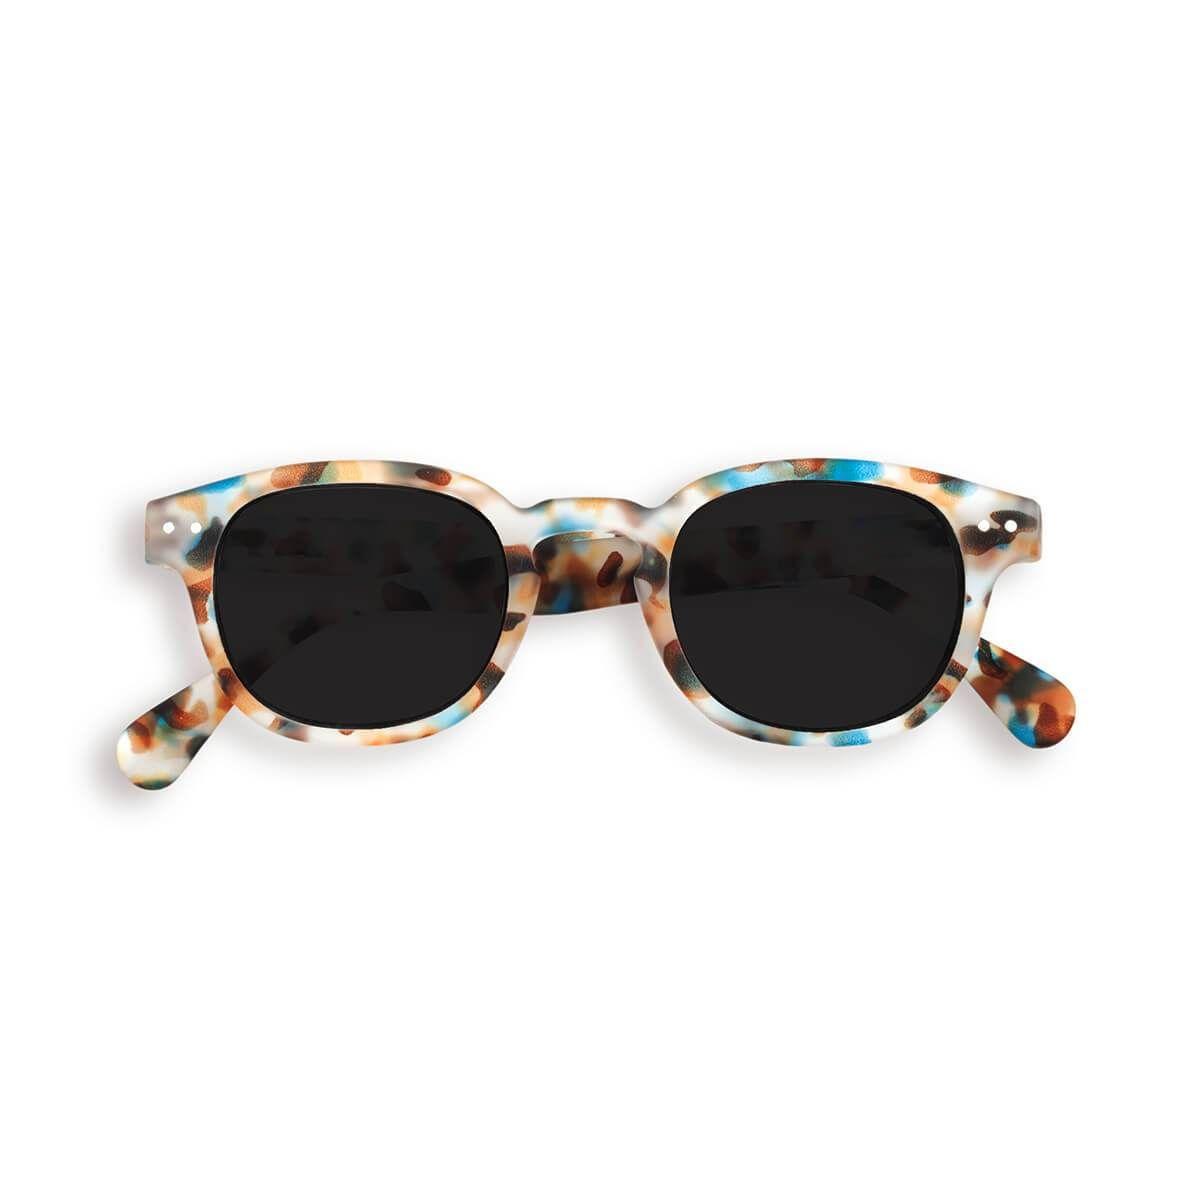 d795684b7 #junioredition.com loves #izipizi Sun Junior Sunglasses (3-10 Years) in  Blue Tortoise by Izipizi – Junior Edition